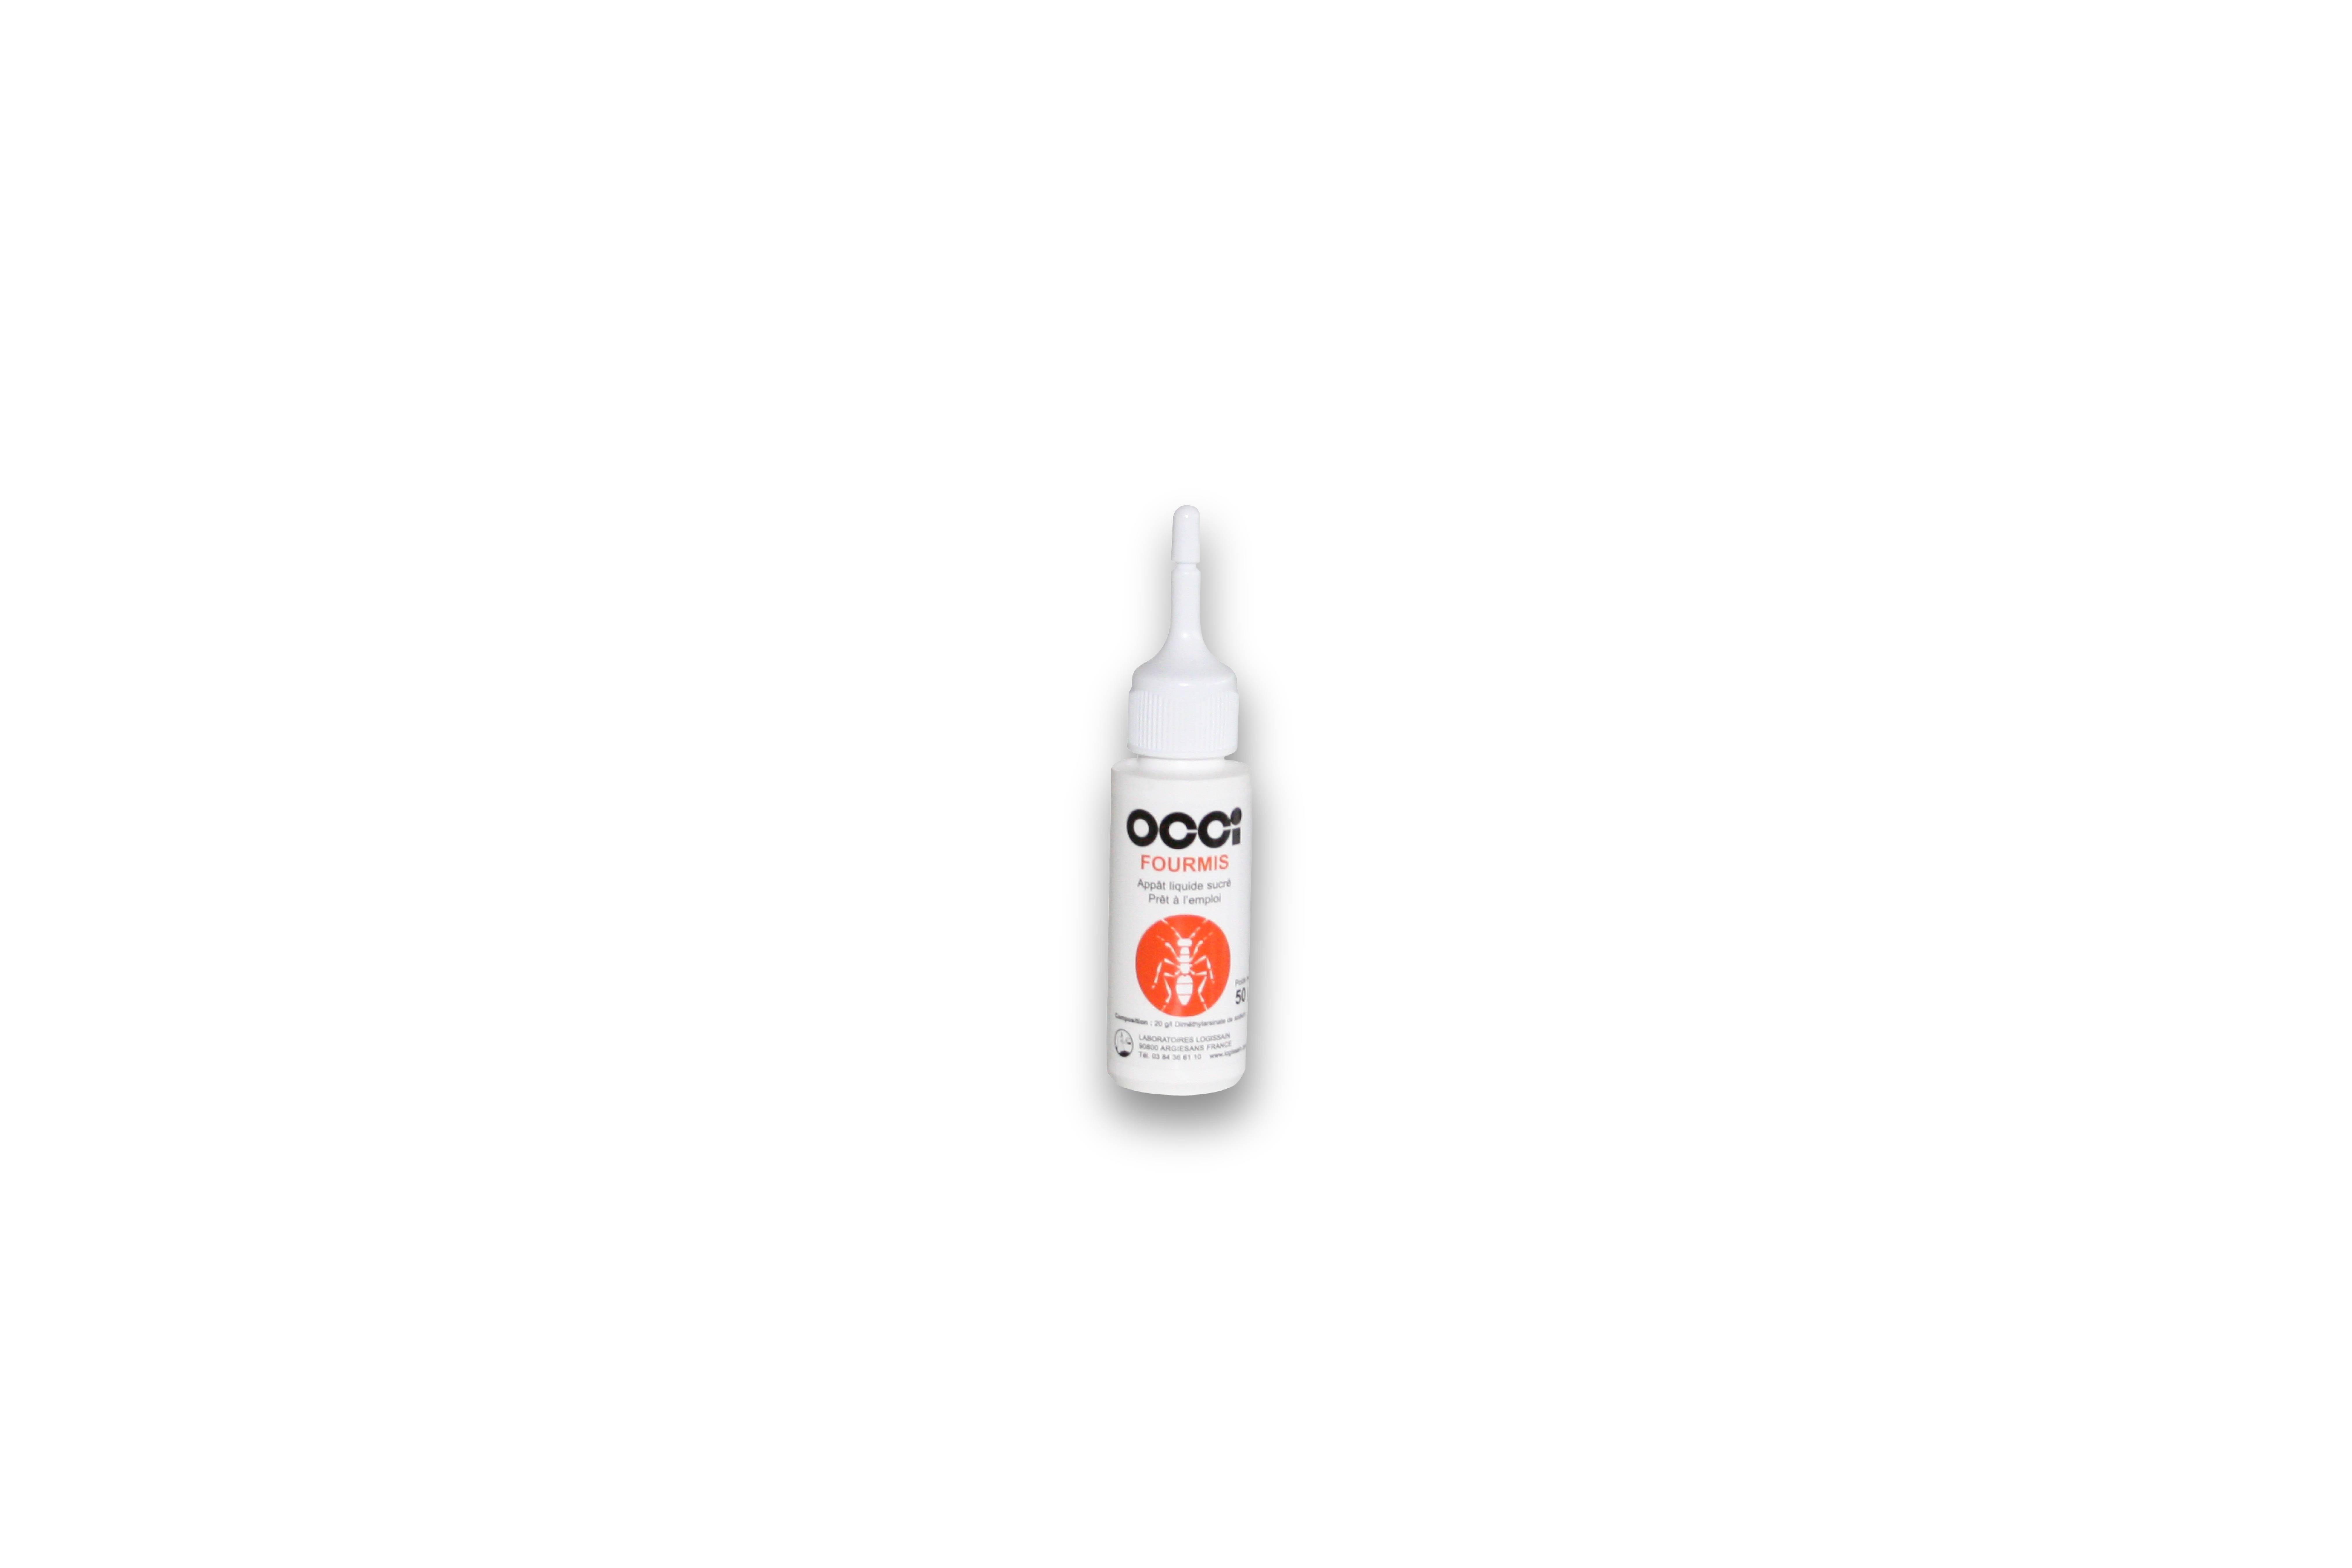 OCCI Fourmis 50g (réf: P2050) Image